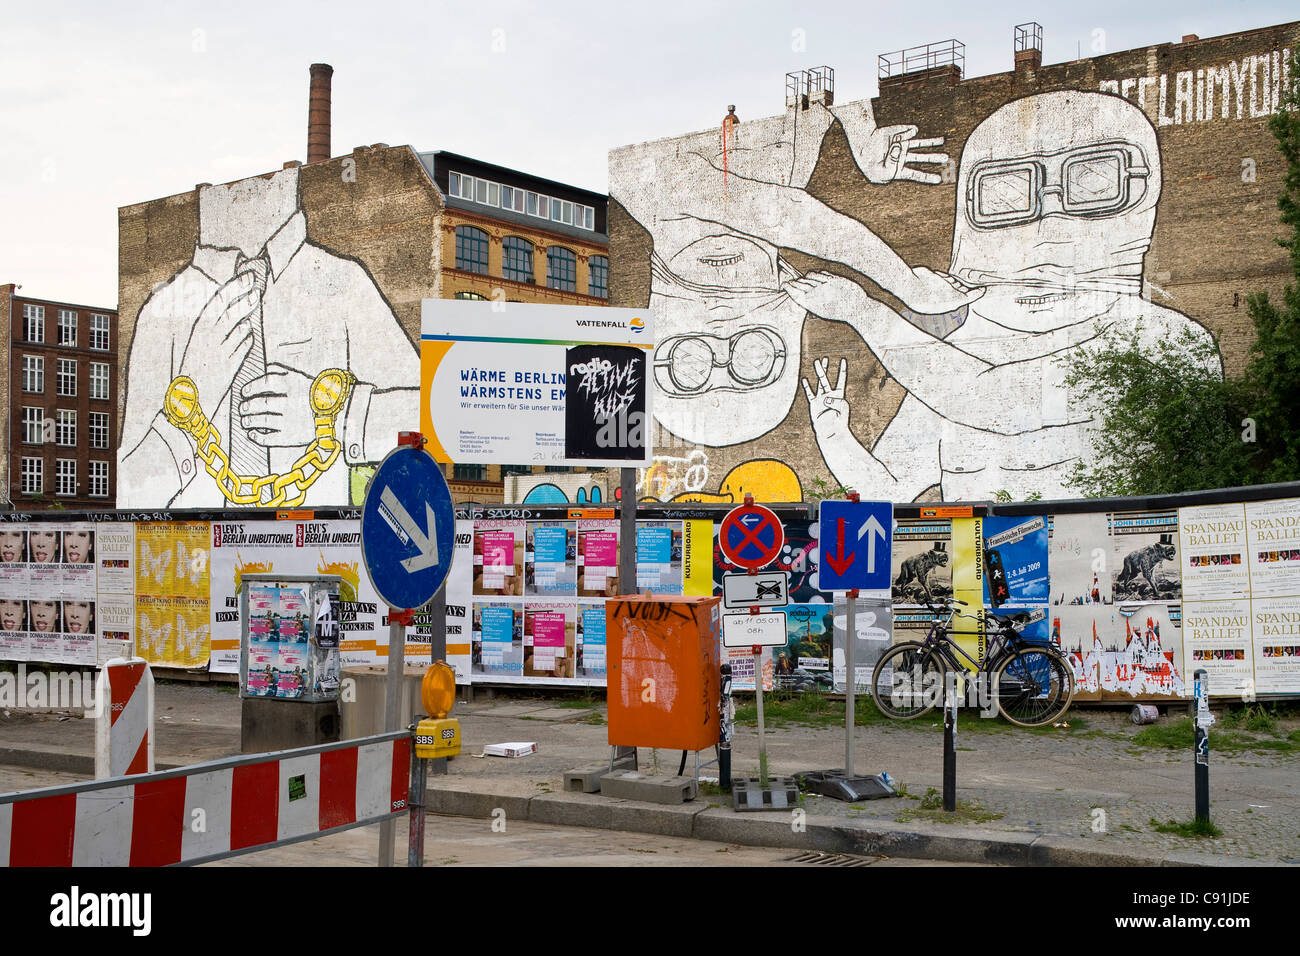 Le animazioni Streetart dall'artista Blu in Cuvry Strasse, Berlino-Kreuzberg, Berlino, Germania, Europa Immagini Stock